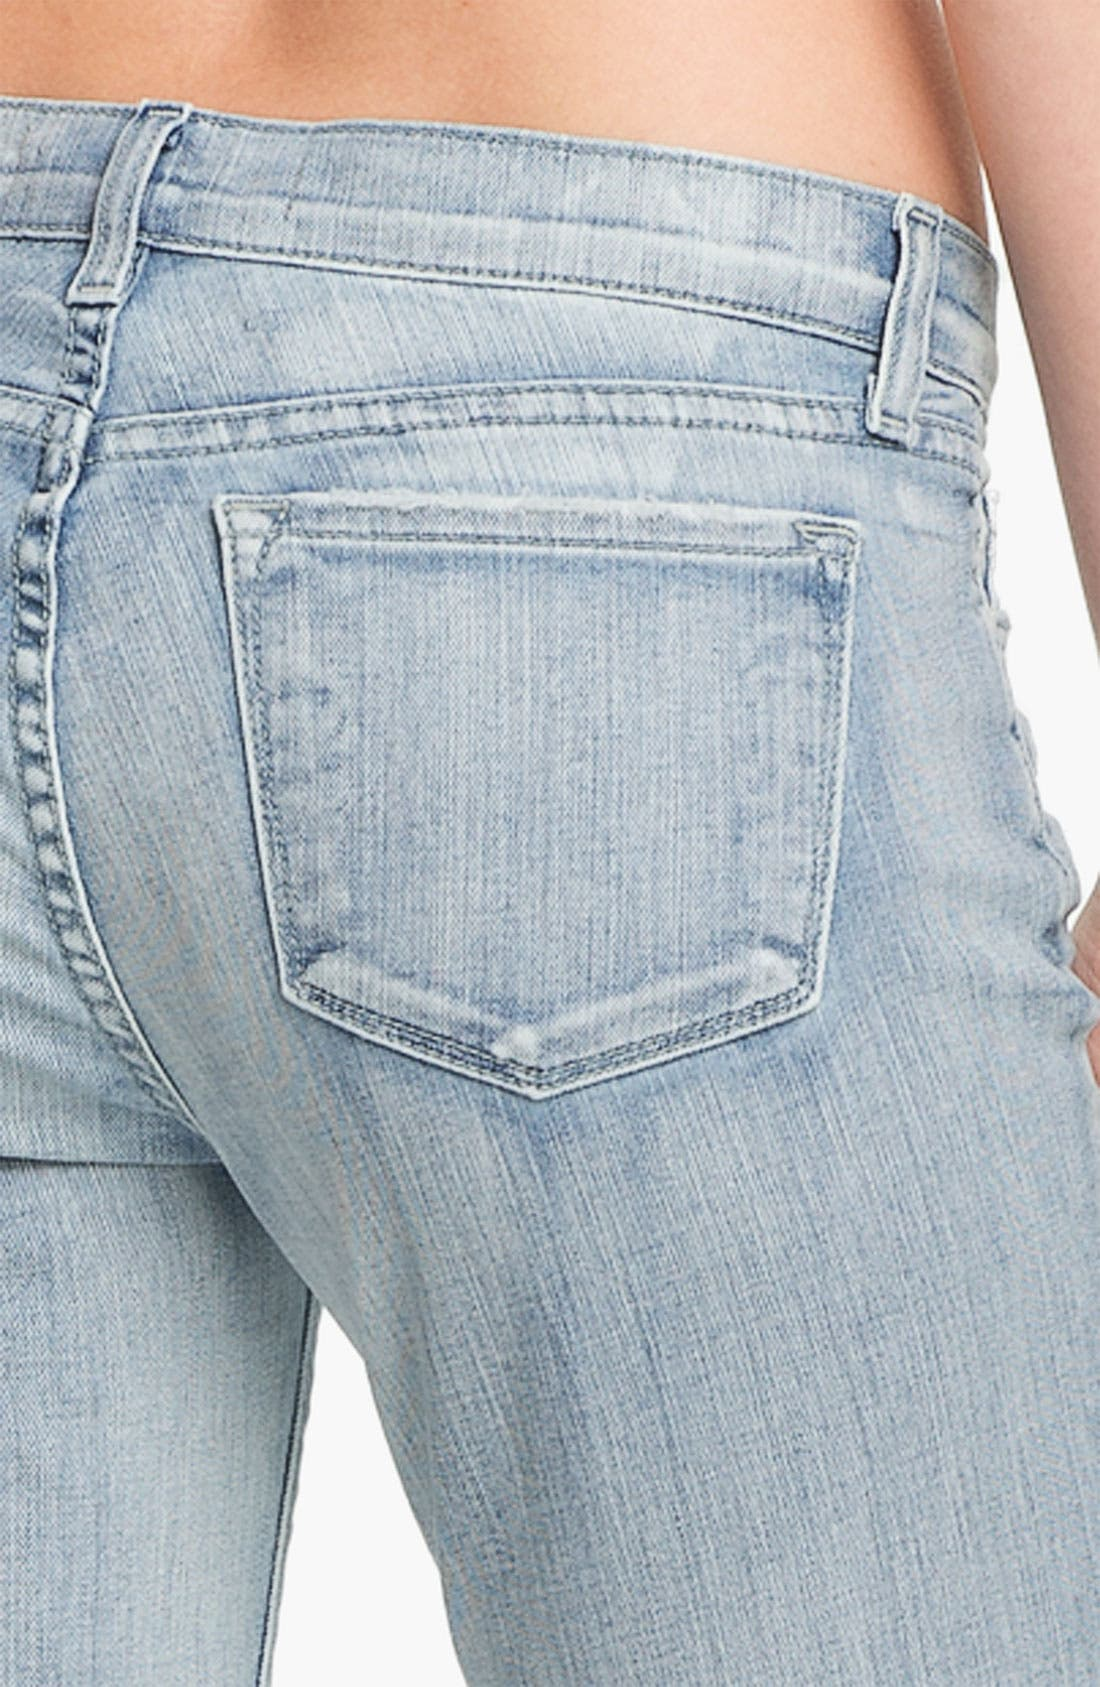 Alternate Image 3  - J Brand '811' Skinny Stretch Jeans (Afterlife)